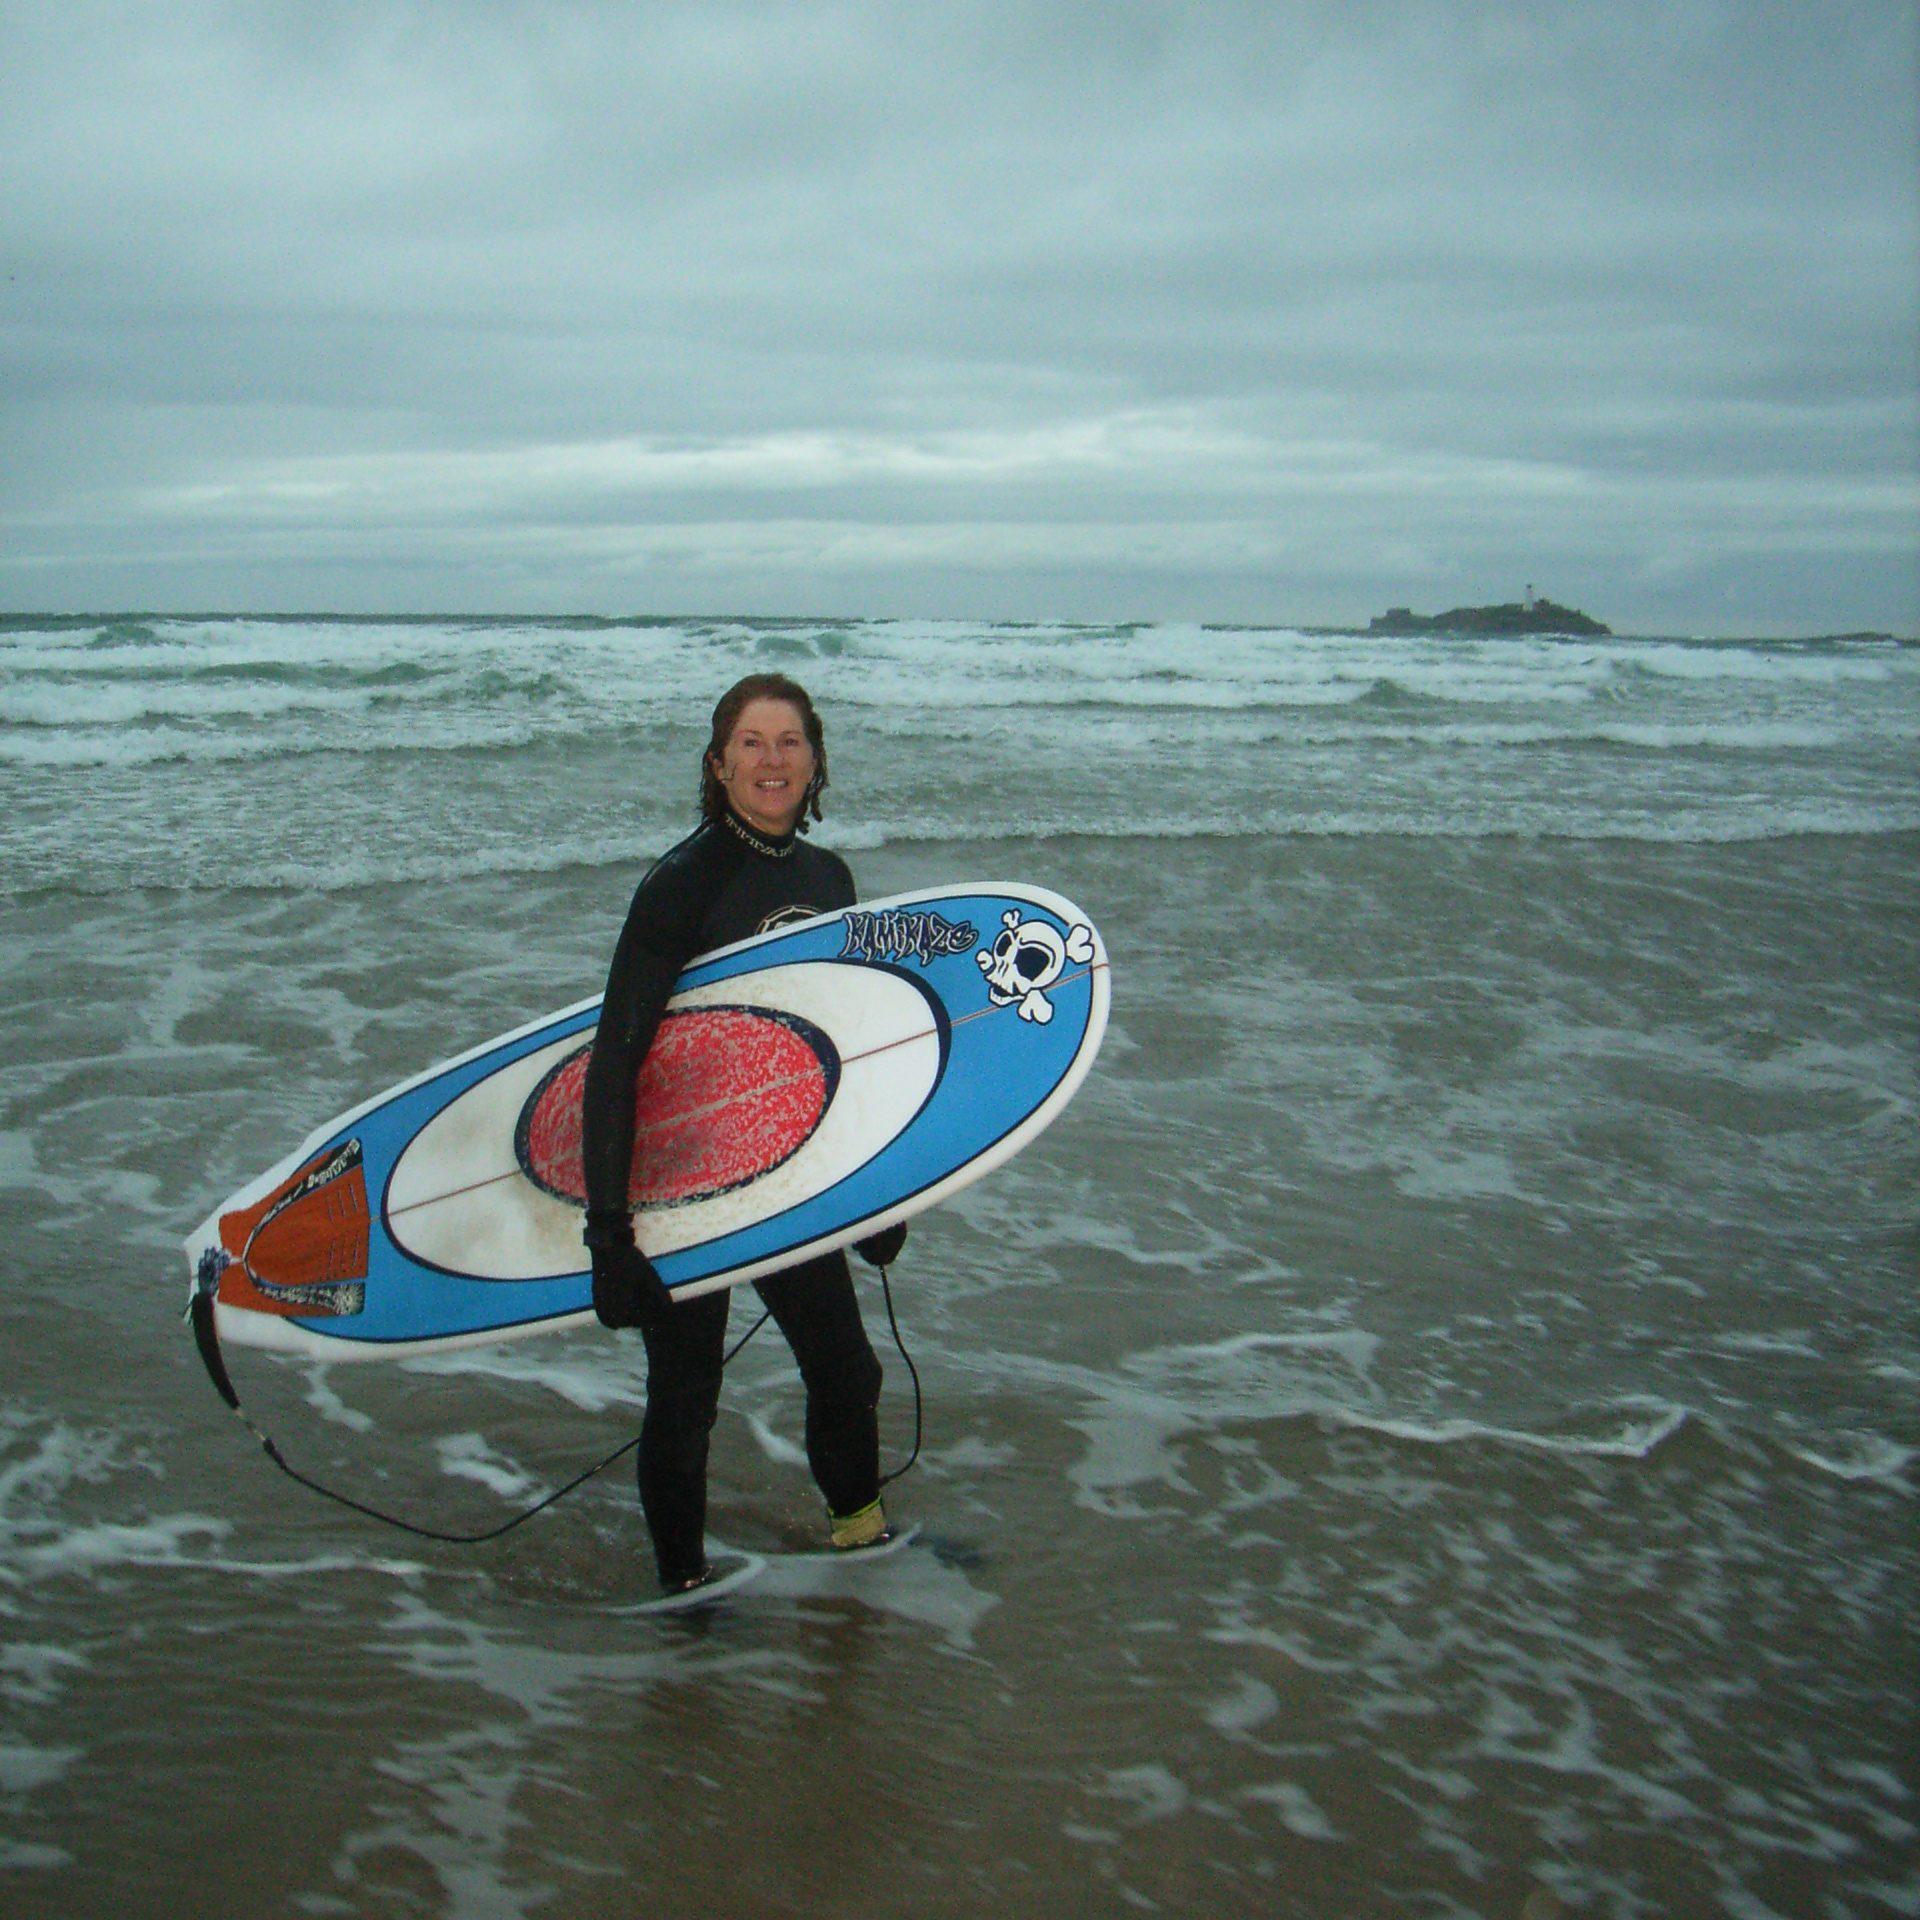 Sally surfing